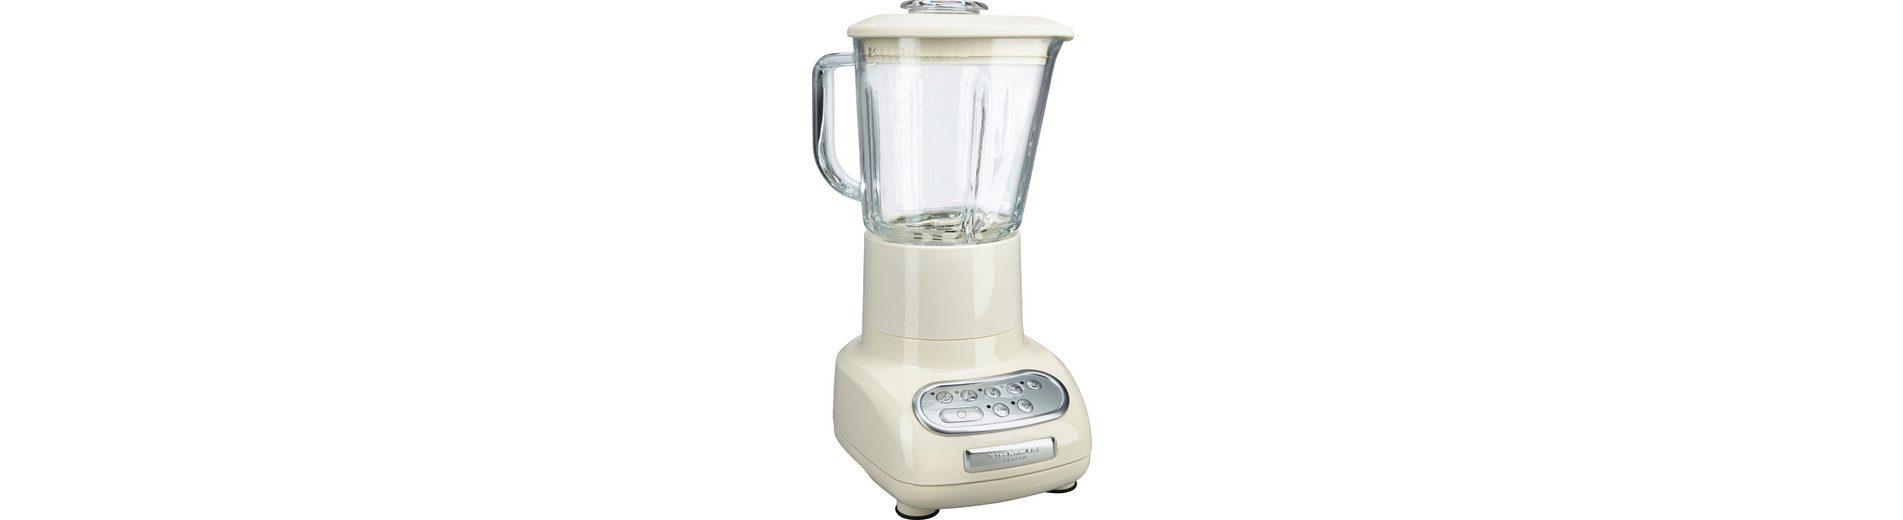 KitchenAid Artisan Standmixer 5KSB5553EAC, 550 Watt, 5 Stufen, Creme